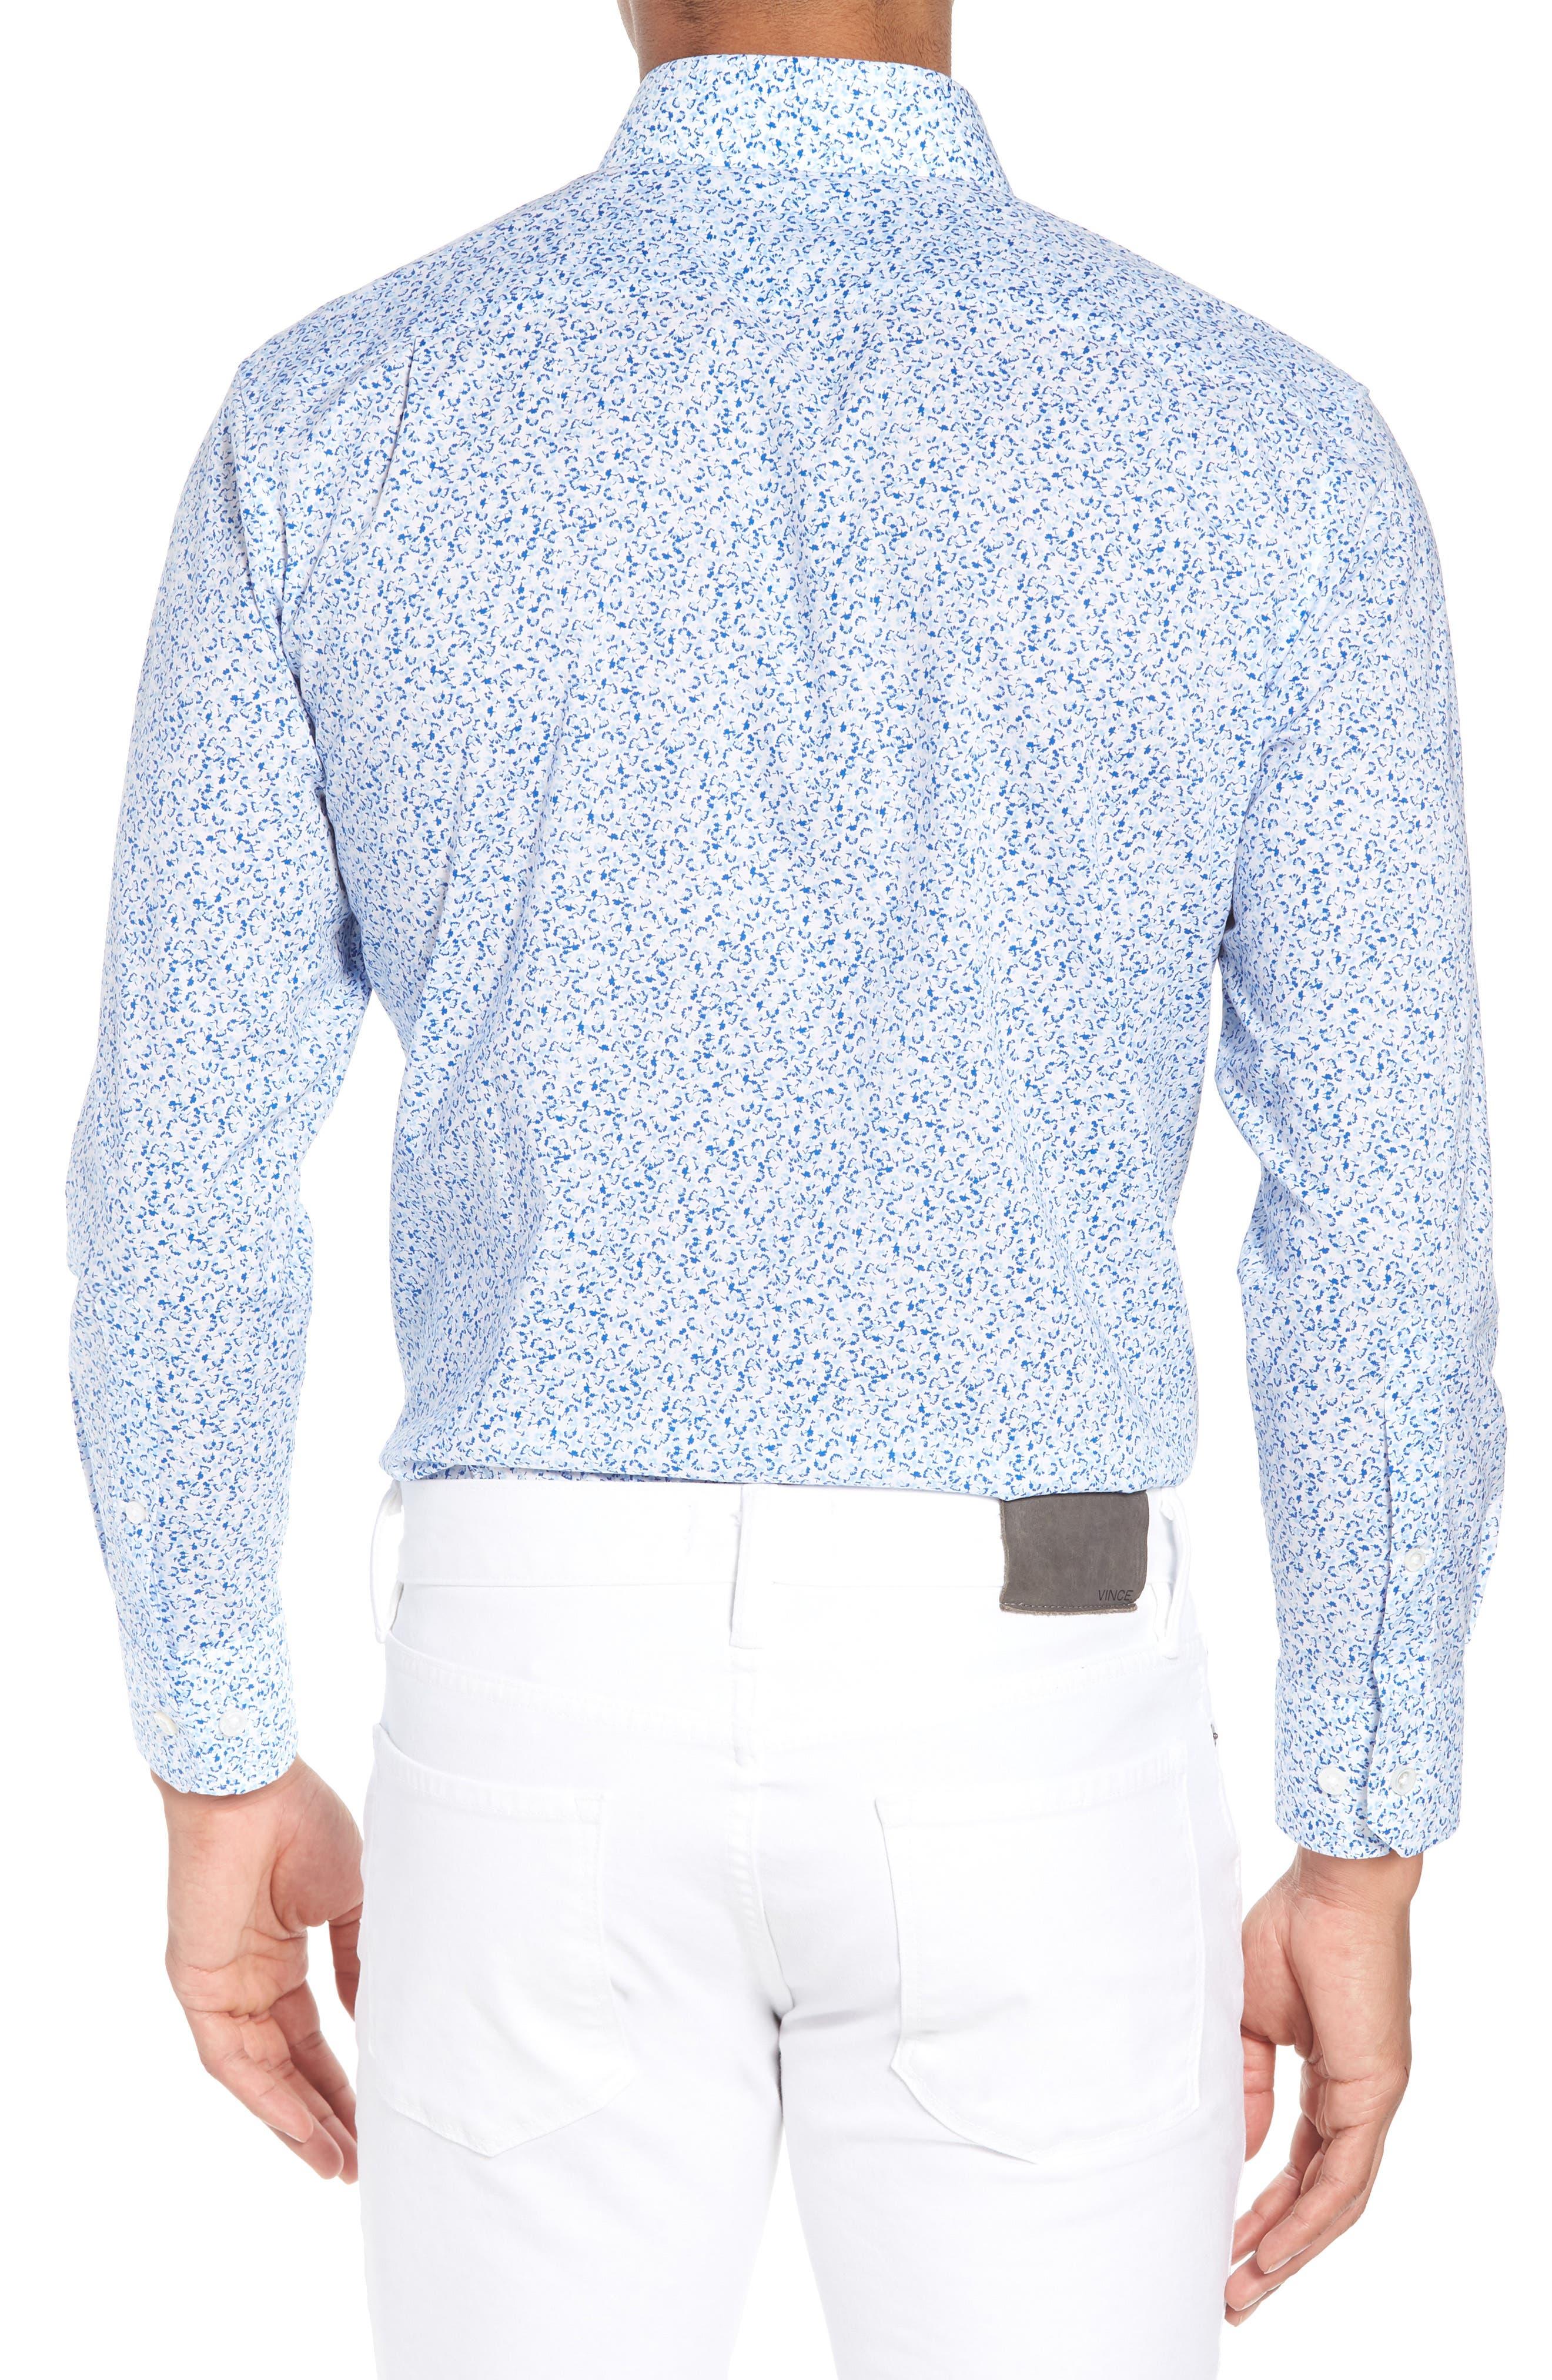 Jetsetter Slim Fit Floral Dress Shirt,                             Alternate thumbnail 3, color,                             Lapis Blue